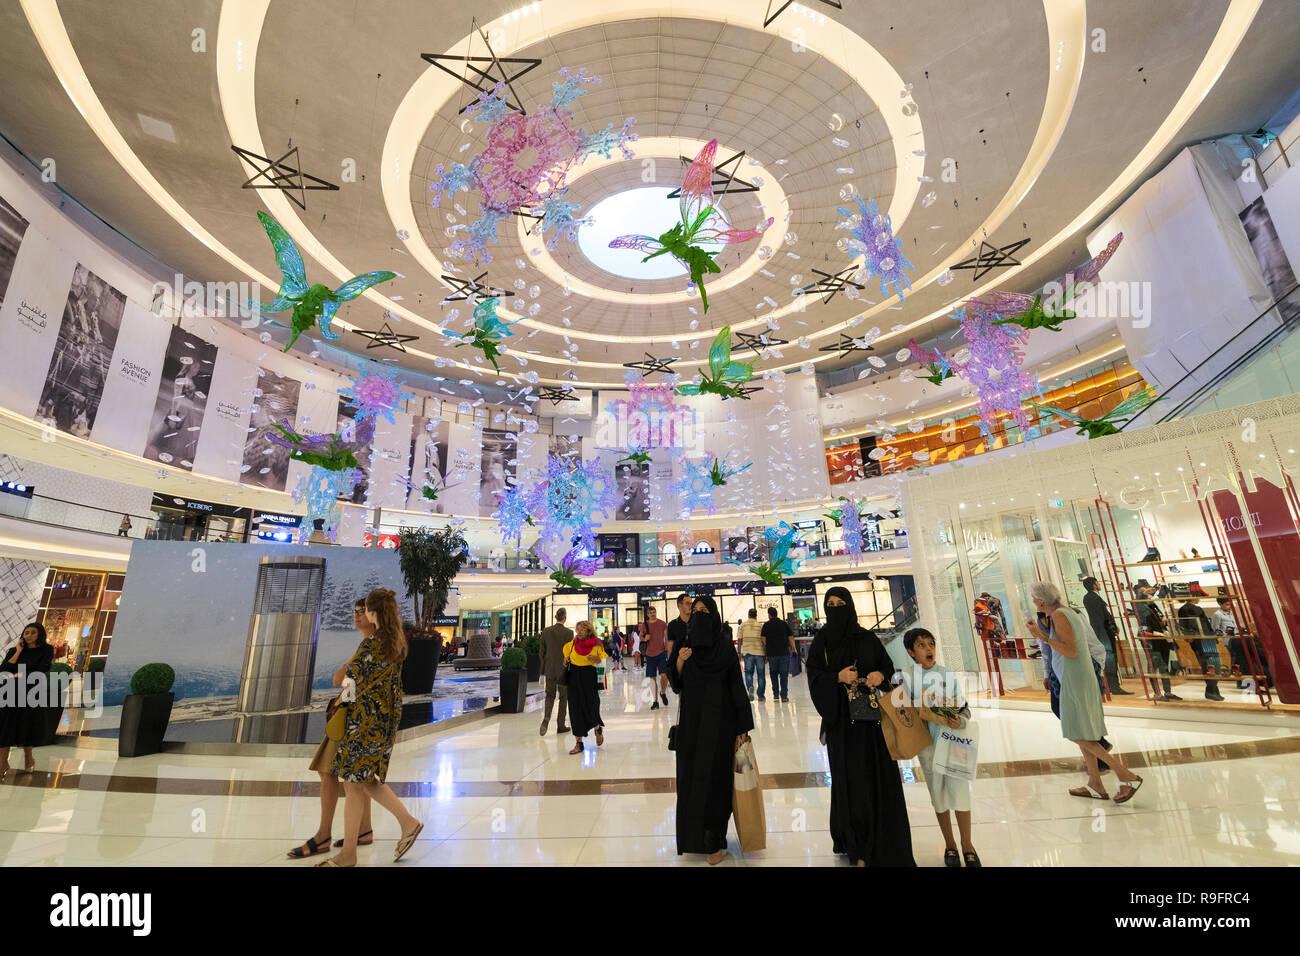 Christmas decorations at Dubai Mall Fashion Avenue , Downtown Dubai, United Arab Emirates - Stock Image